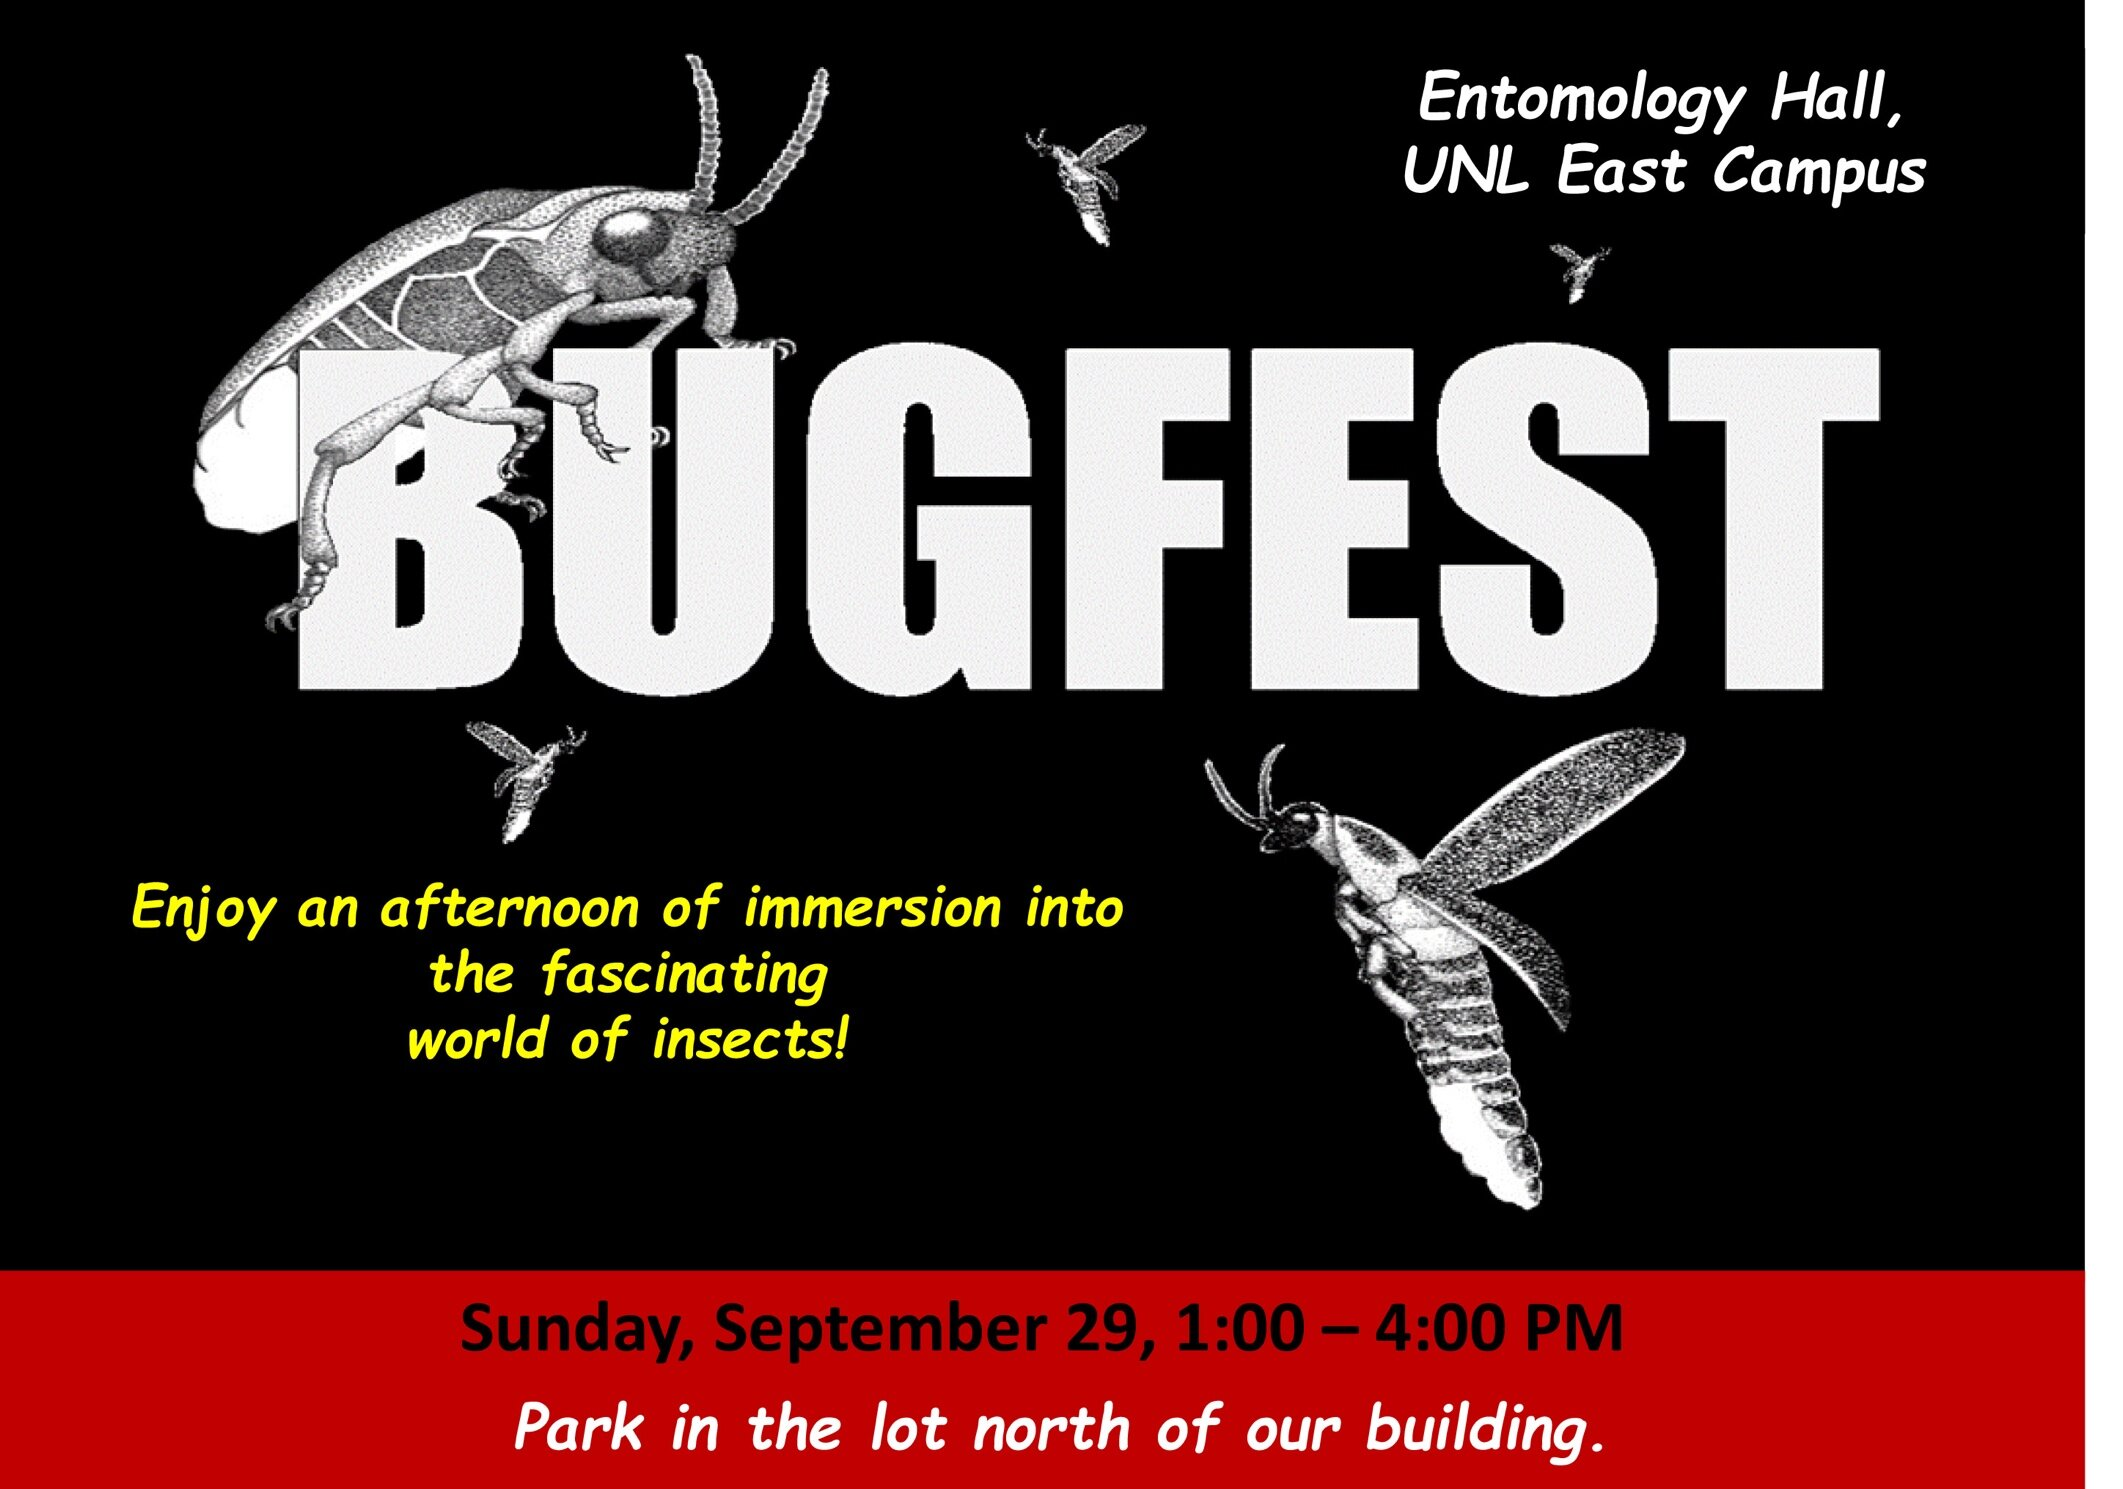 Bugfest2019.jpg